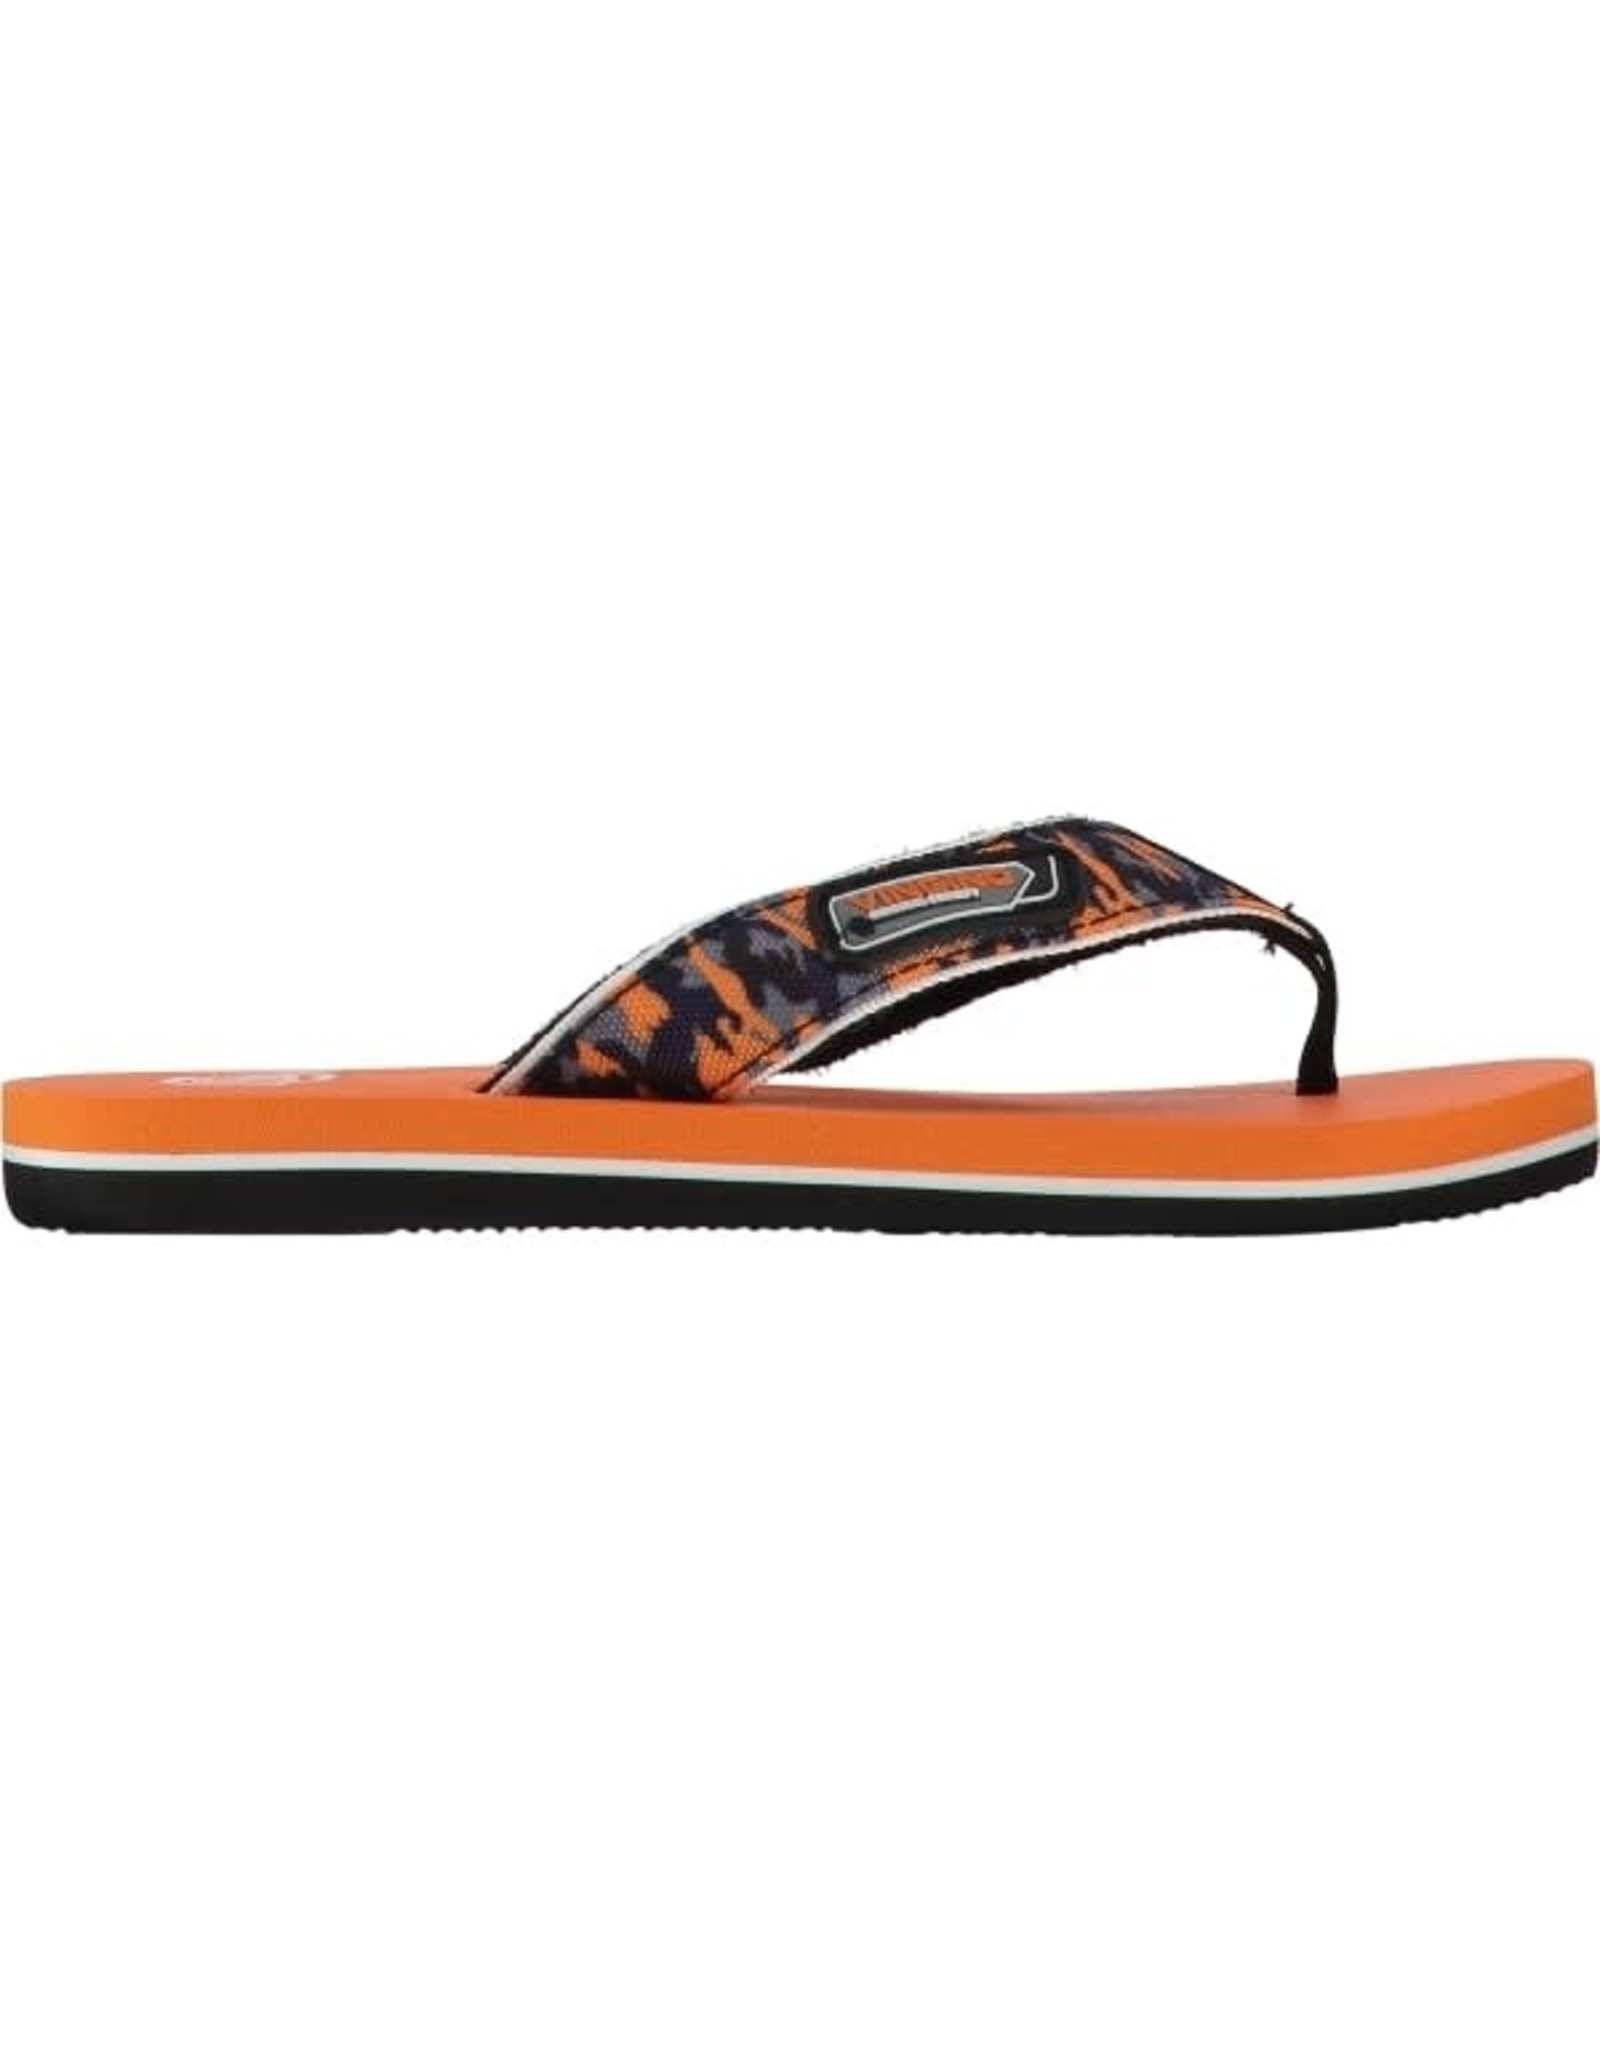 Vingino Vingino jongens slippers Jax Multicolor Orange